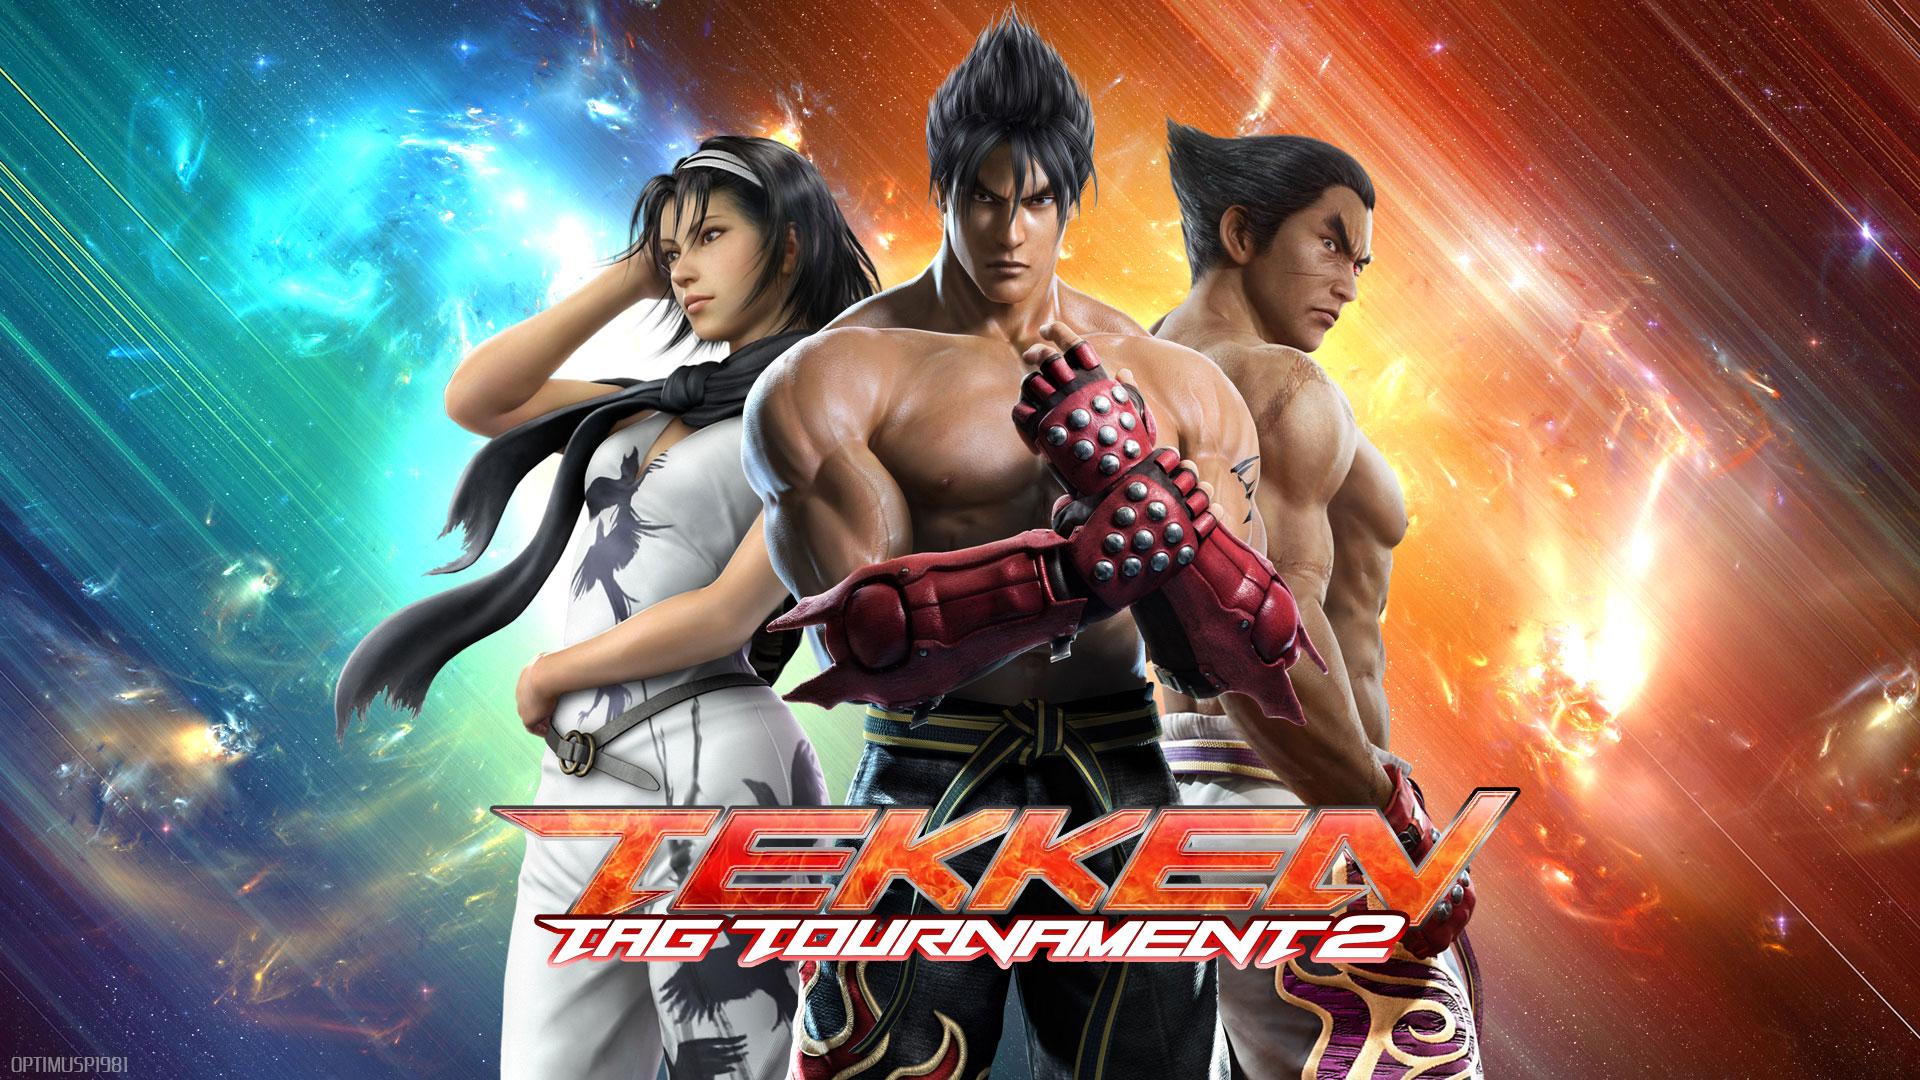 https://thejesterscorner.files.wordpress.com/2012/08/tekken-tag-tournament-2-1920x1080-wallpaper-gamerswallpapers-com.jpeg